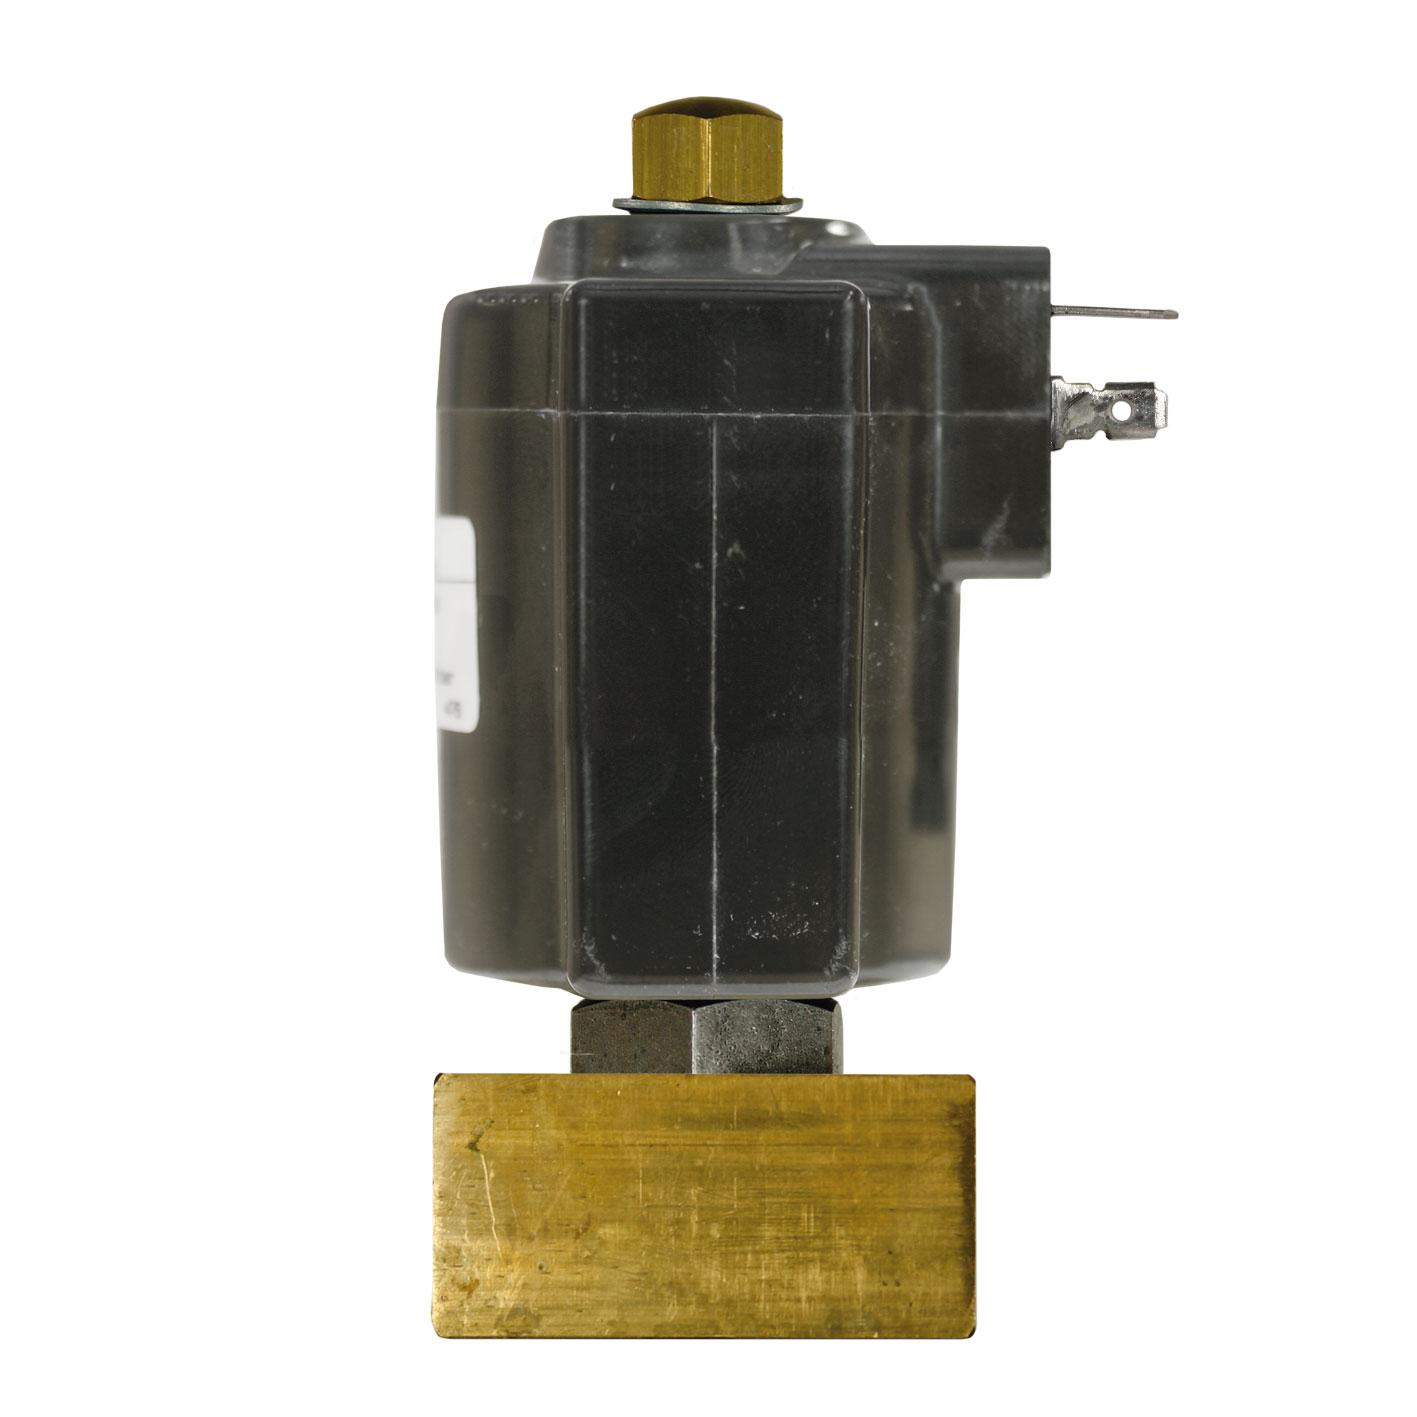 ELECTROVANNE HP 1/4F 220V 180 BAR 90 DEG/C